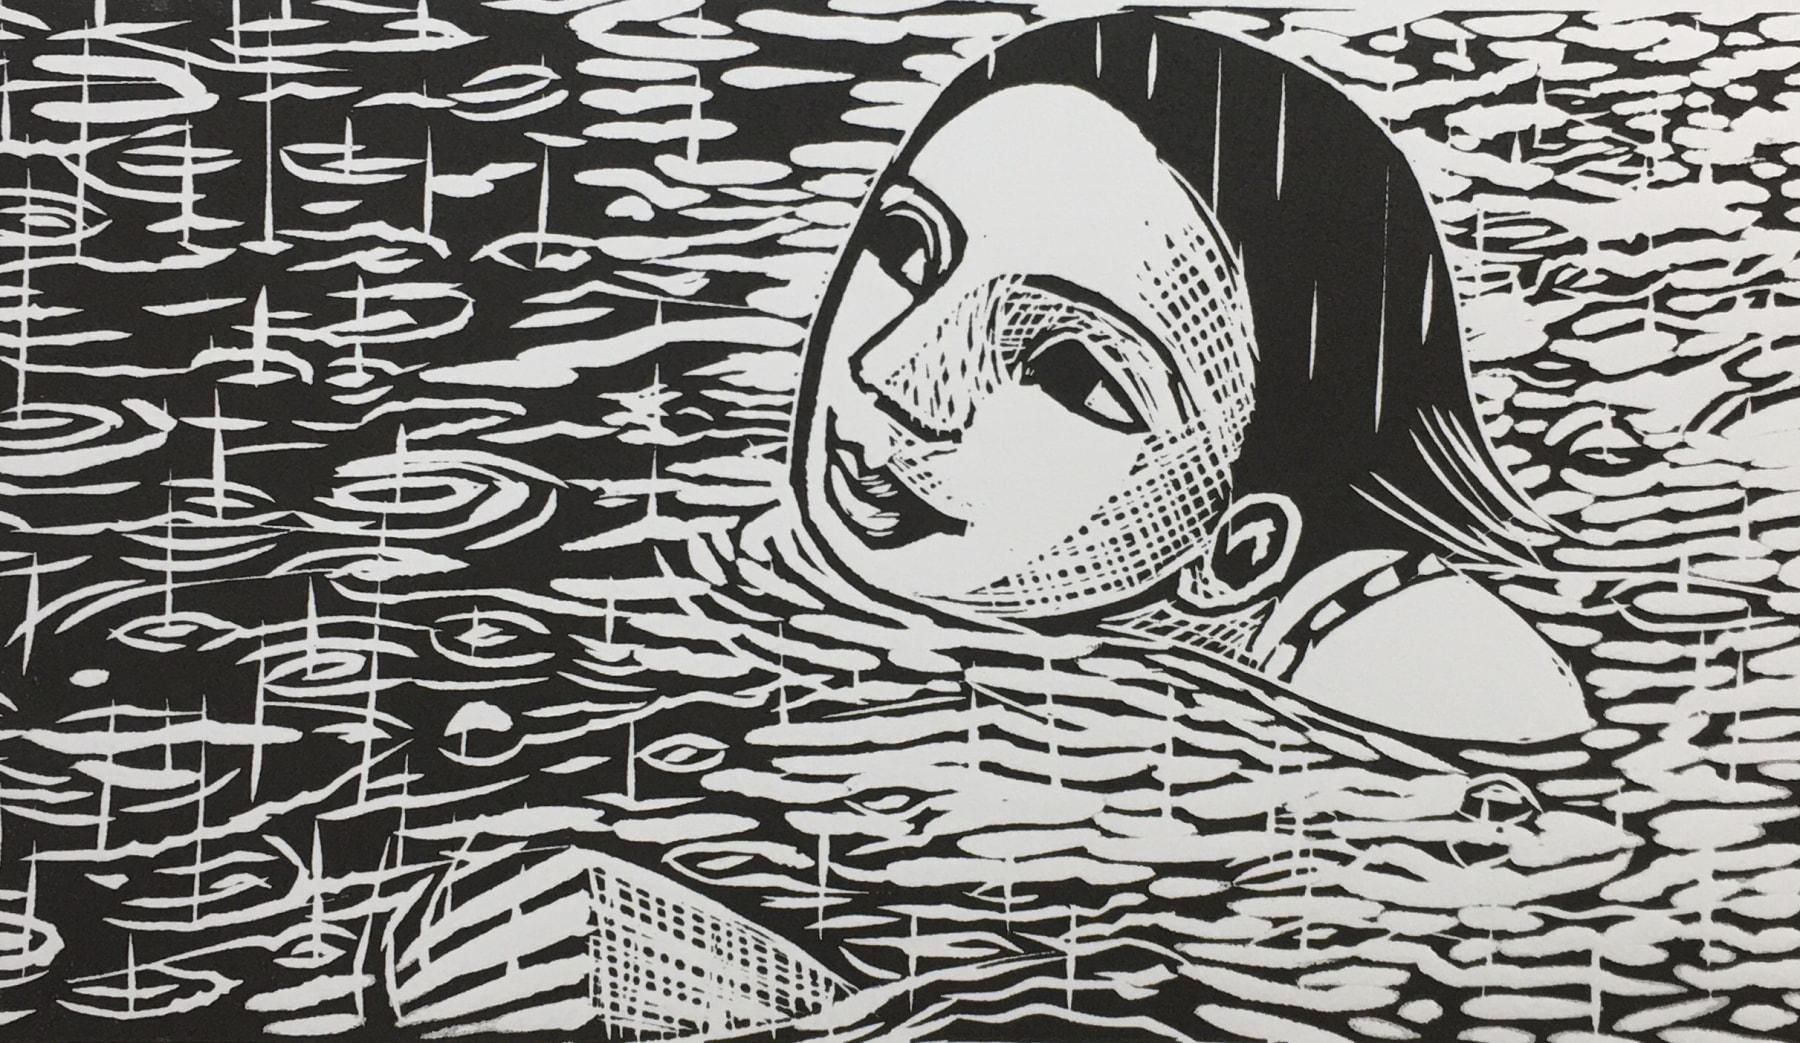 Anita Klein, Swimming in the Rain, 2020